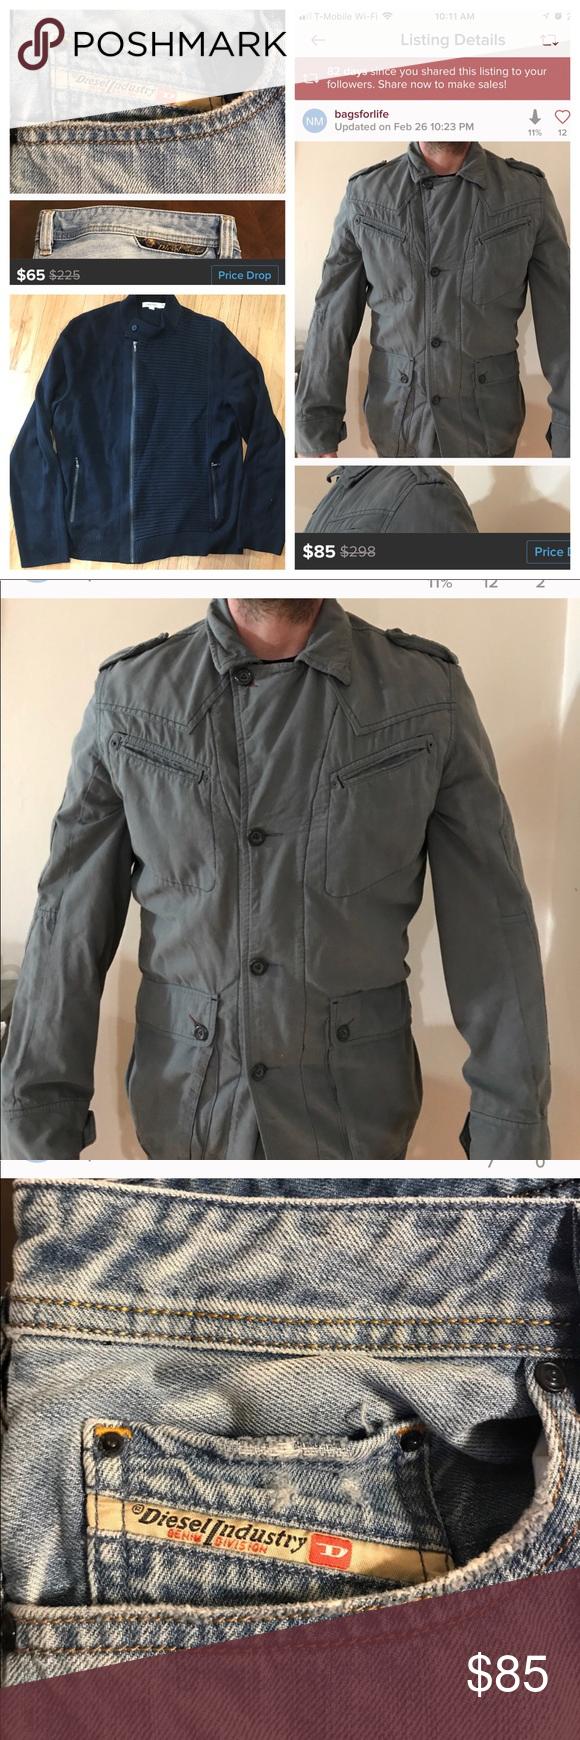 SALE THREE ITEMS Diesel Jacket size Large, Diesel Jeans36W